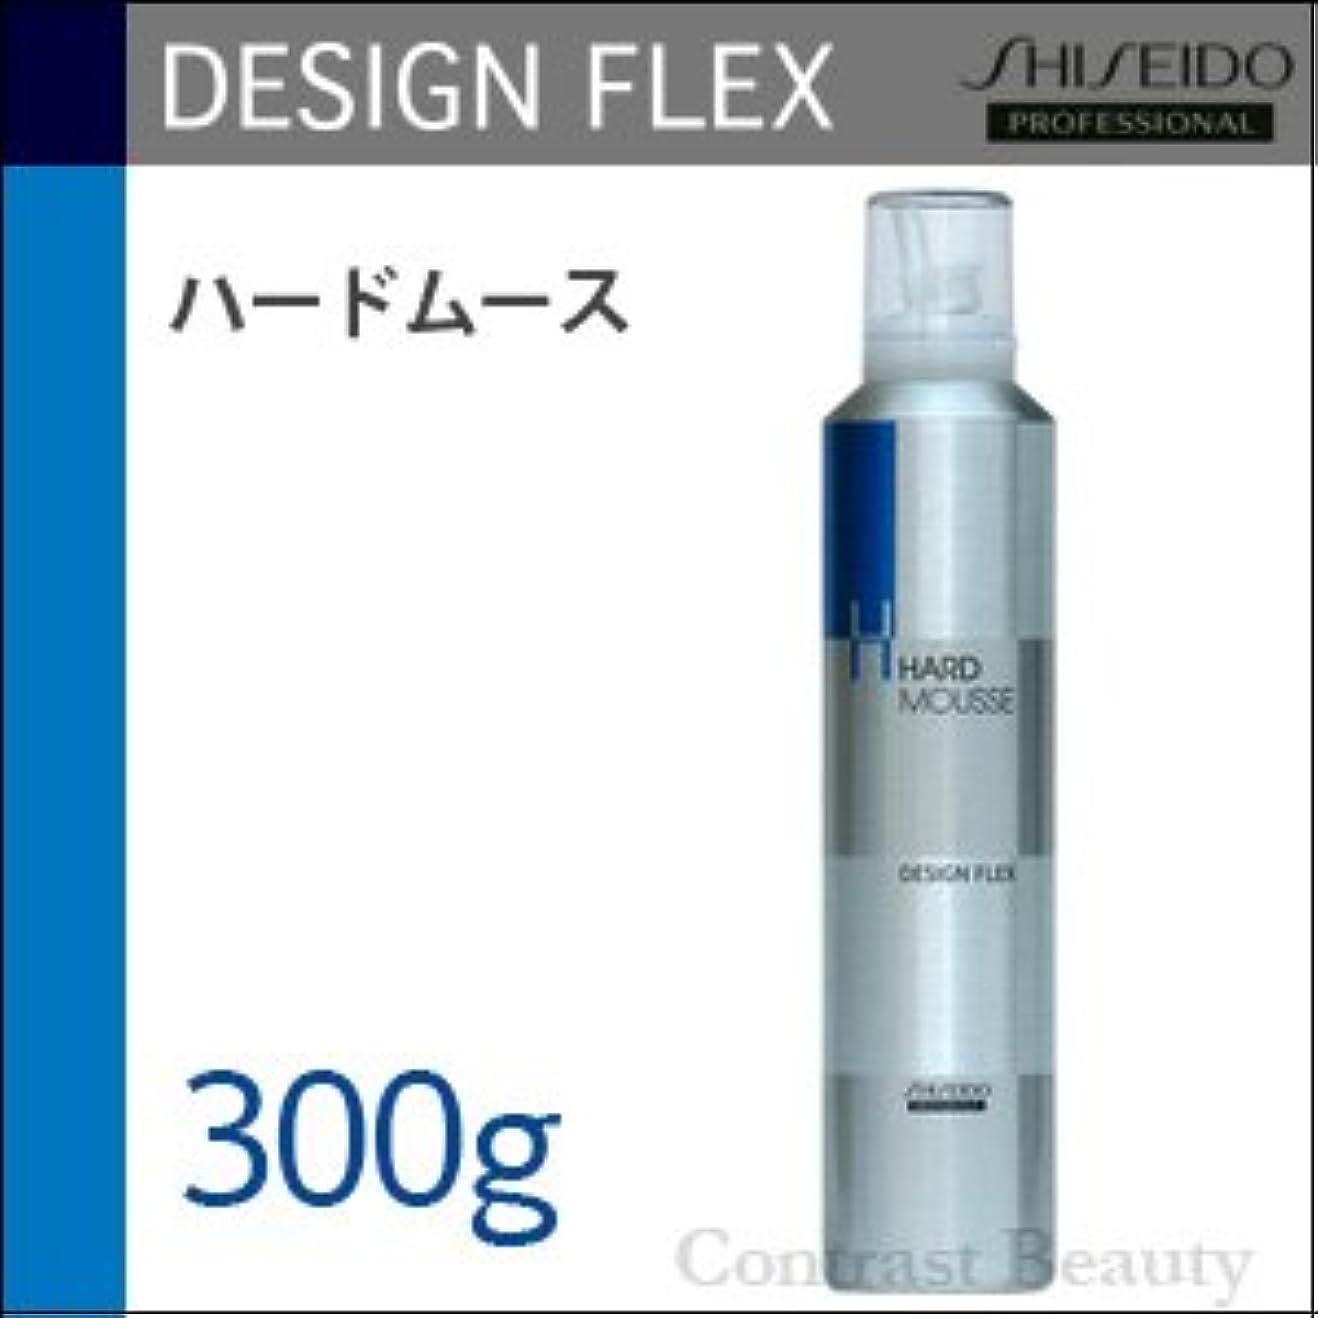 【x2個セット】 資生堂 デザインフレックス ハードムース 300g